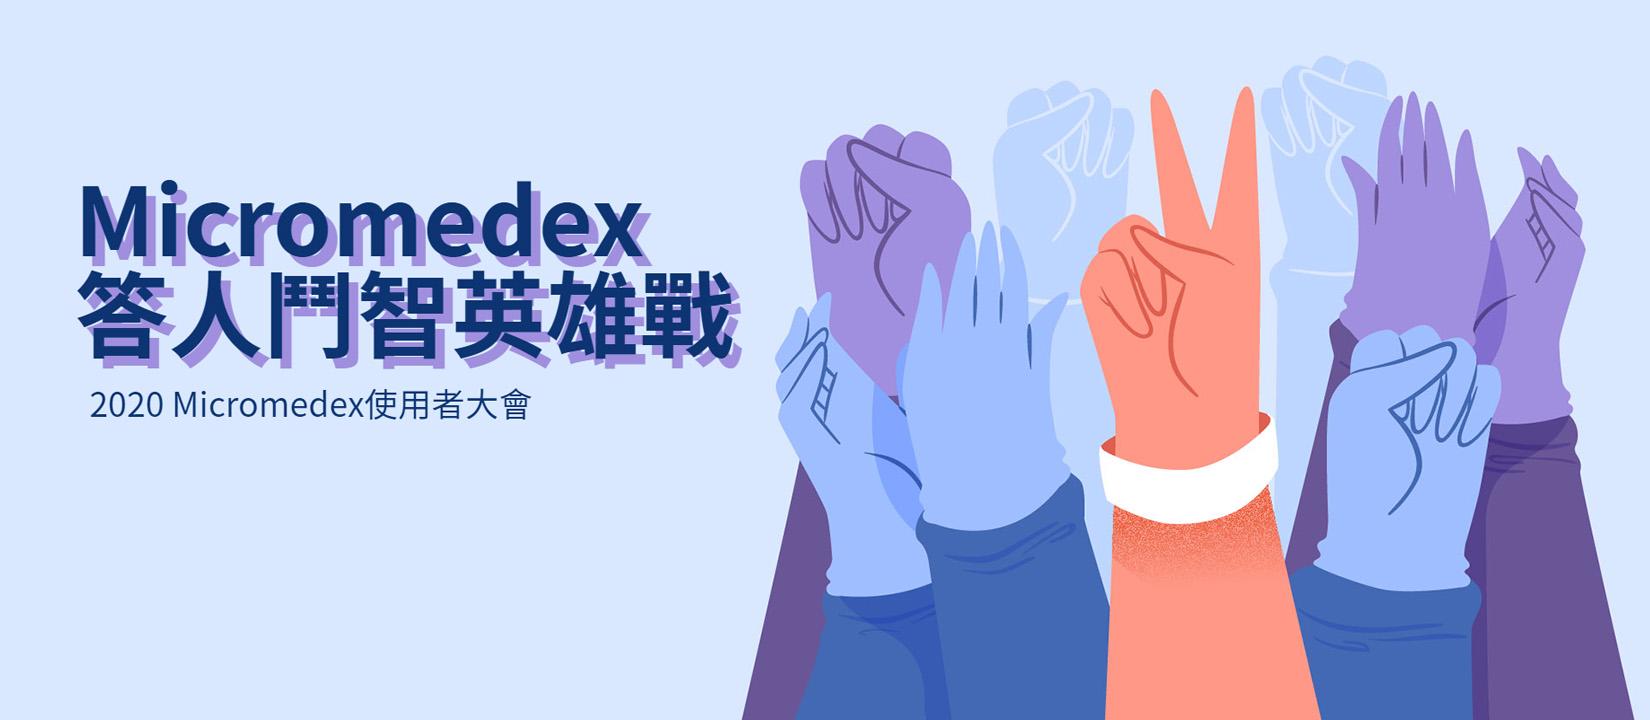 《Micromedex 答人鬥智英雄戰》線上有獎徵答活動 Online Quiz